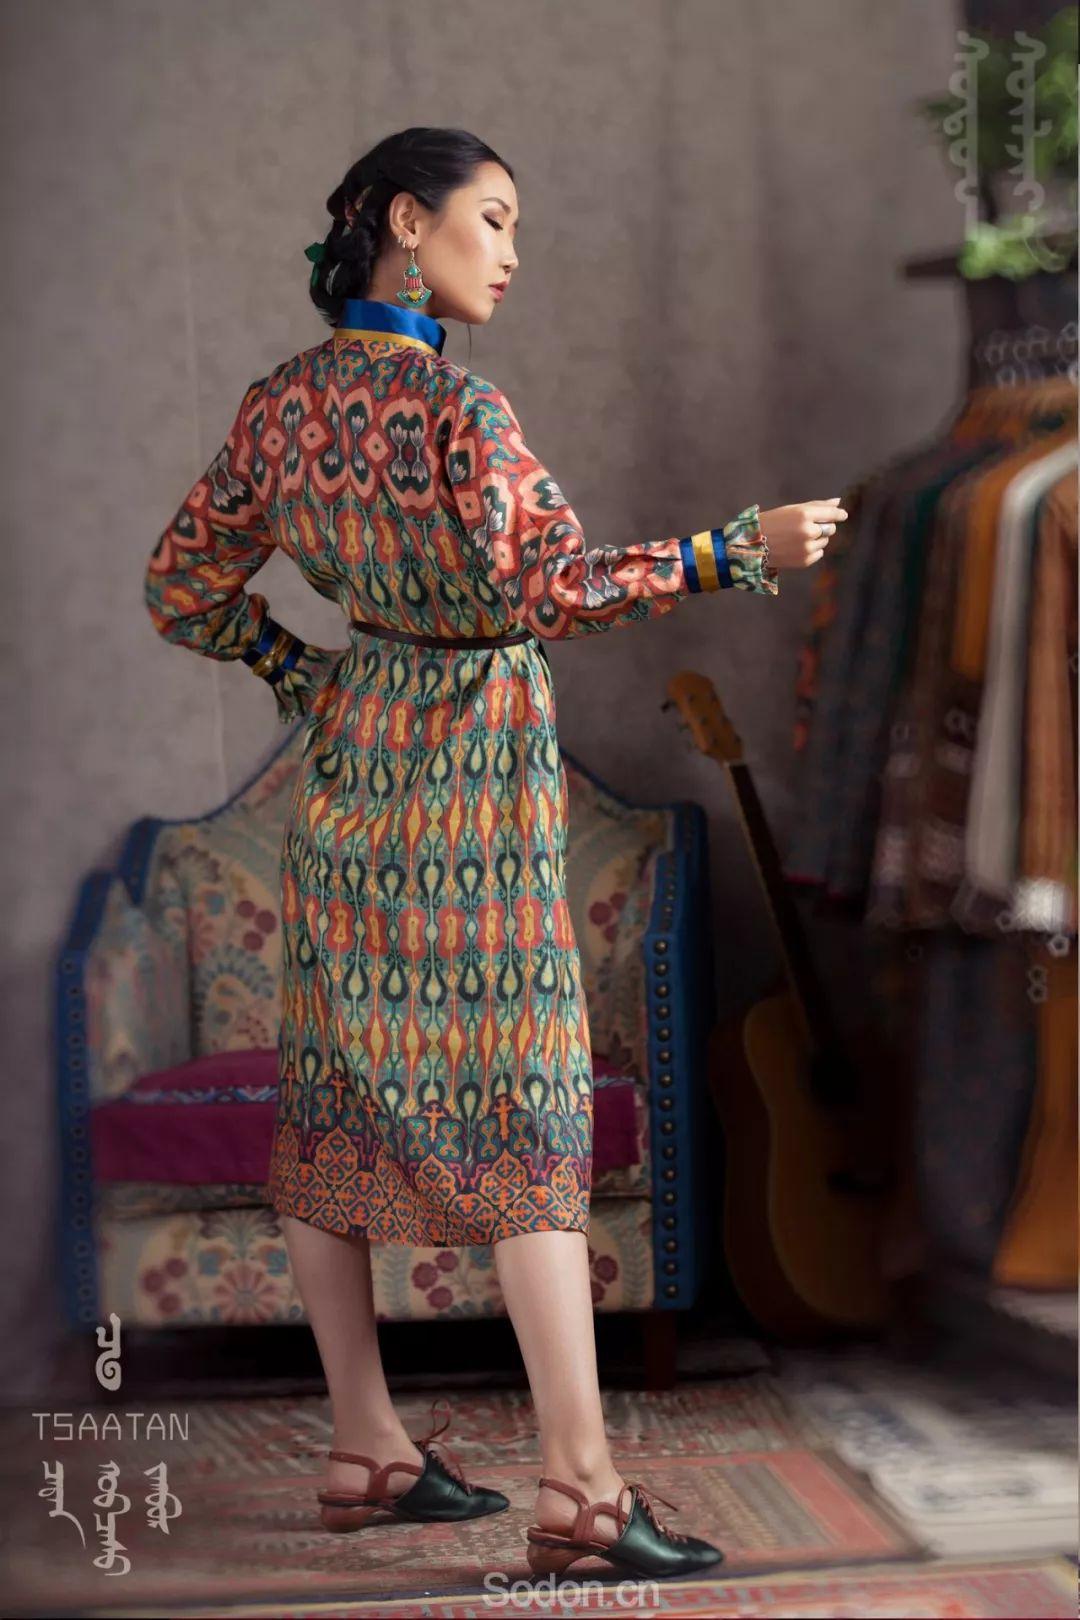 TSAATAN蒙古时装 2019夏季新款首发 第69张